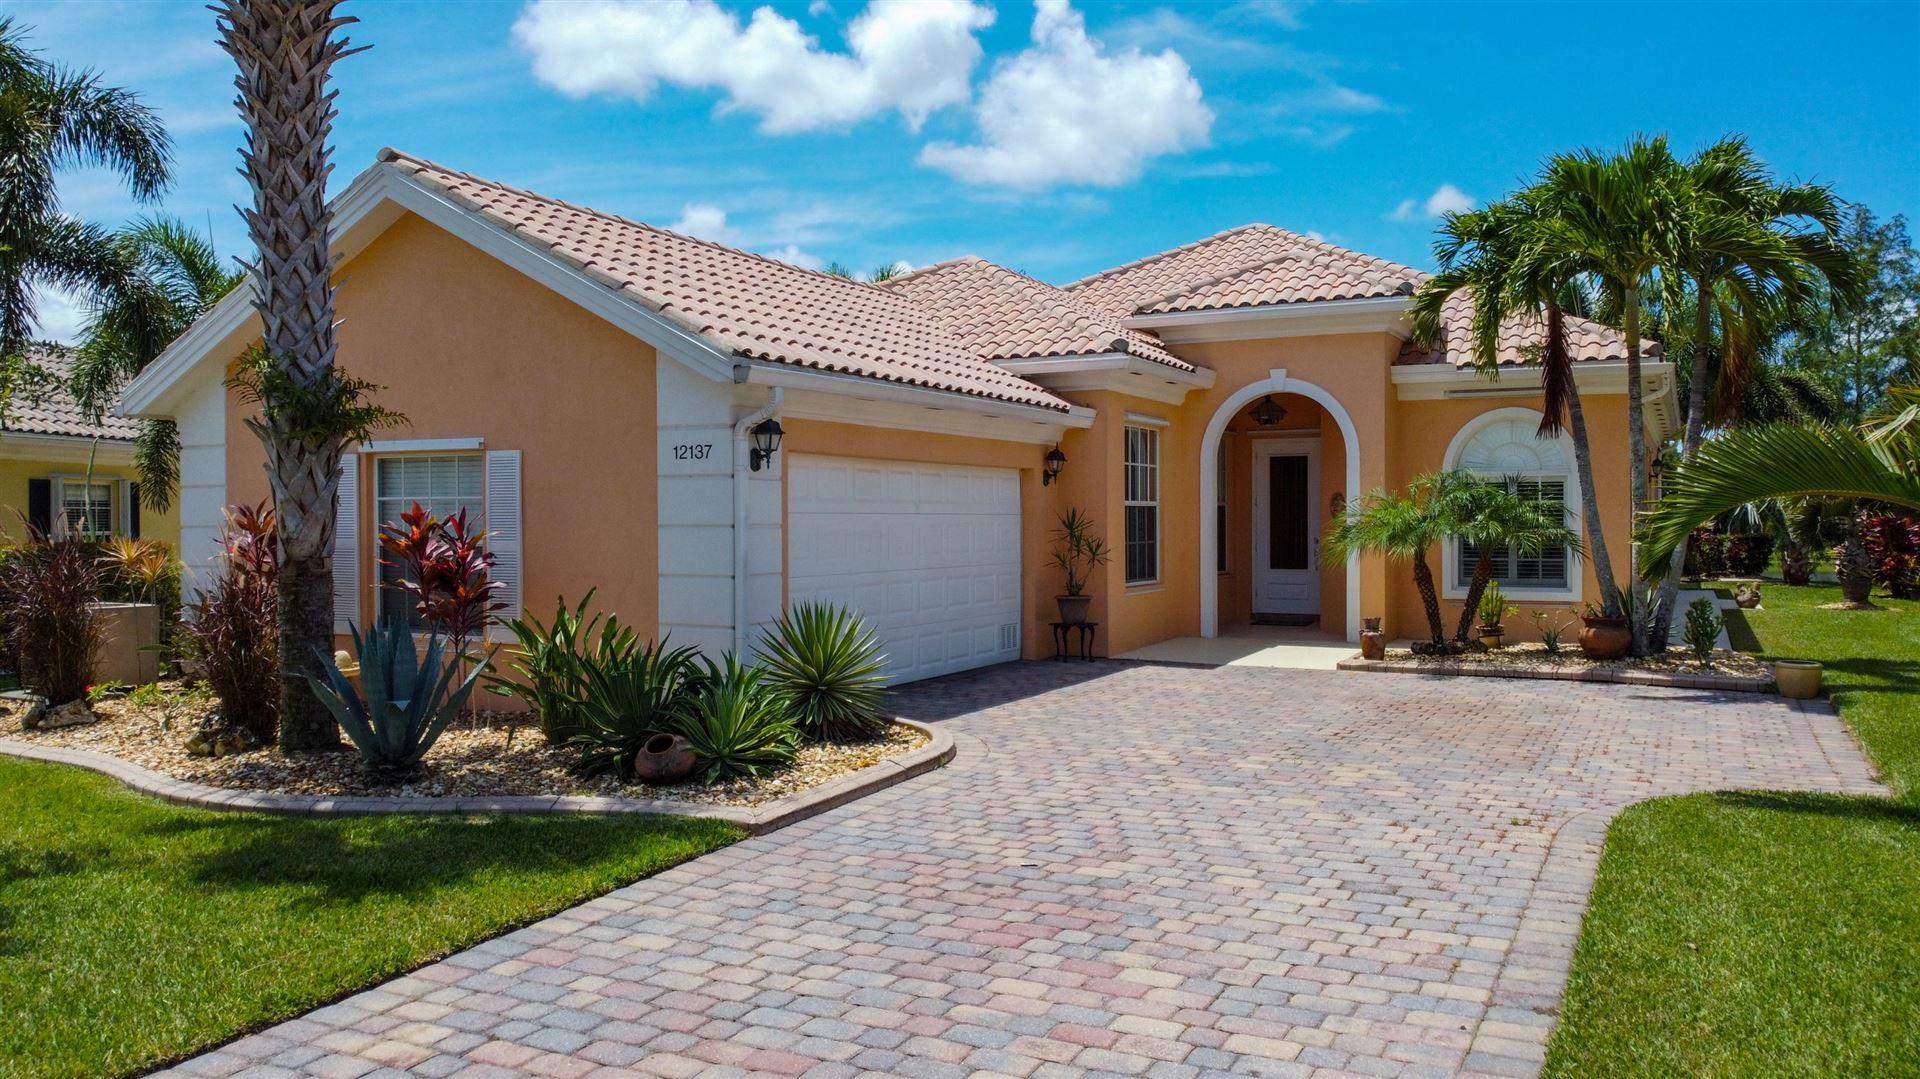 12137 SW Keating Drive, Port Saint Lucie, FL 34987 - #: RX-10643443